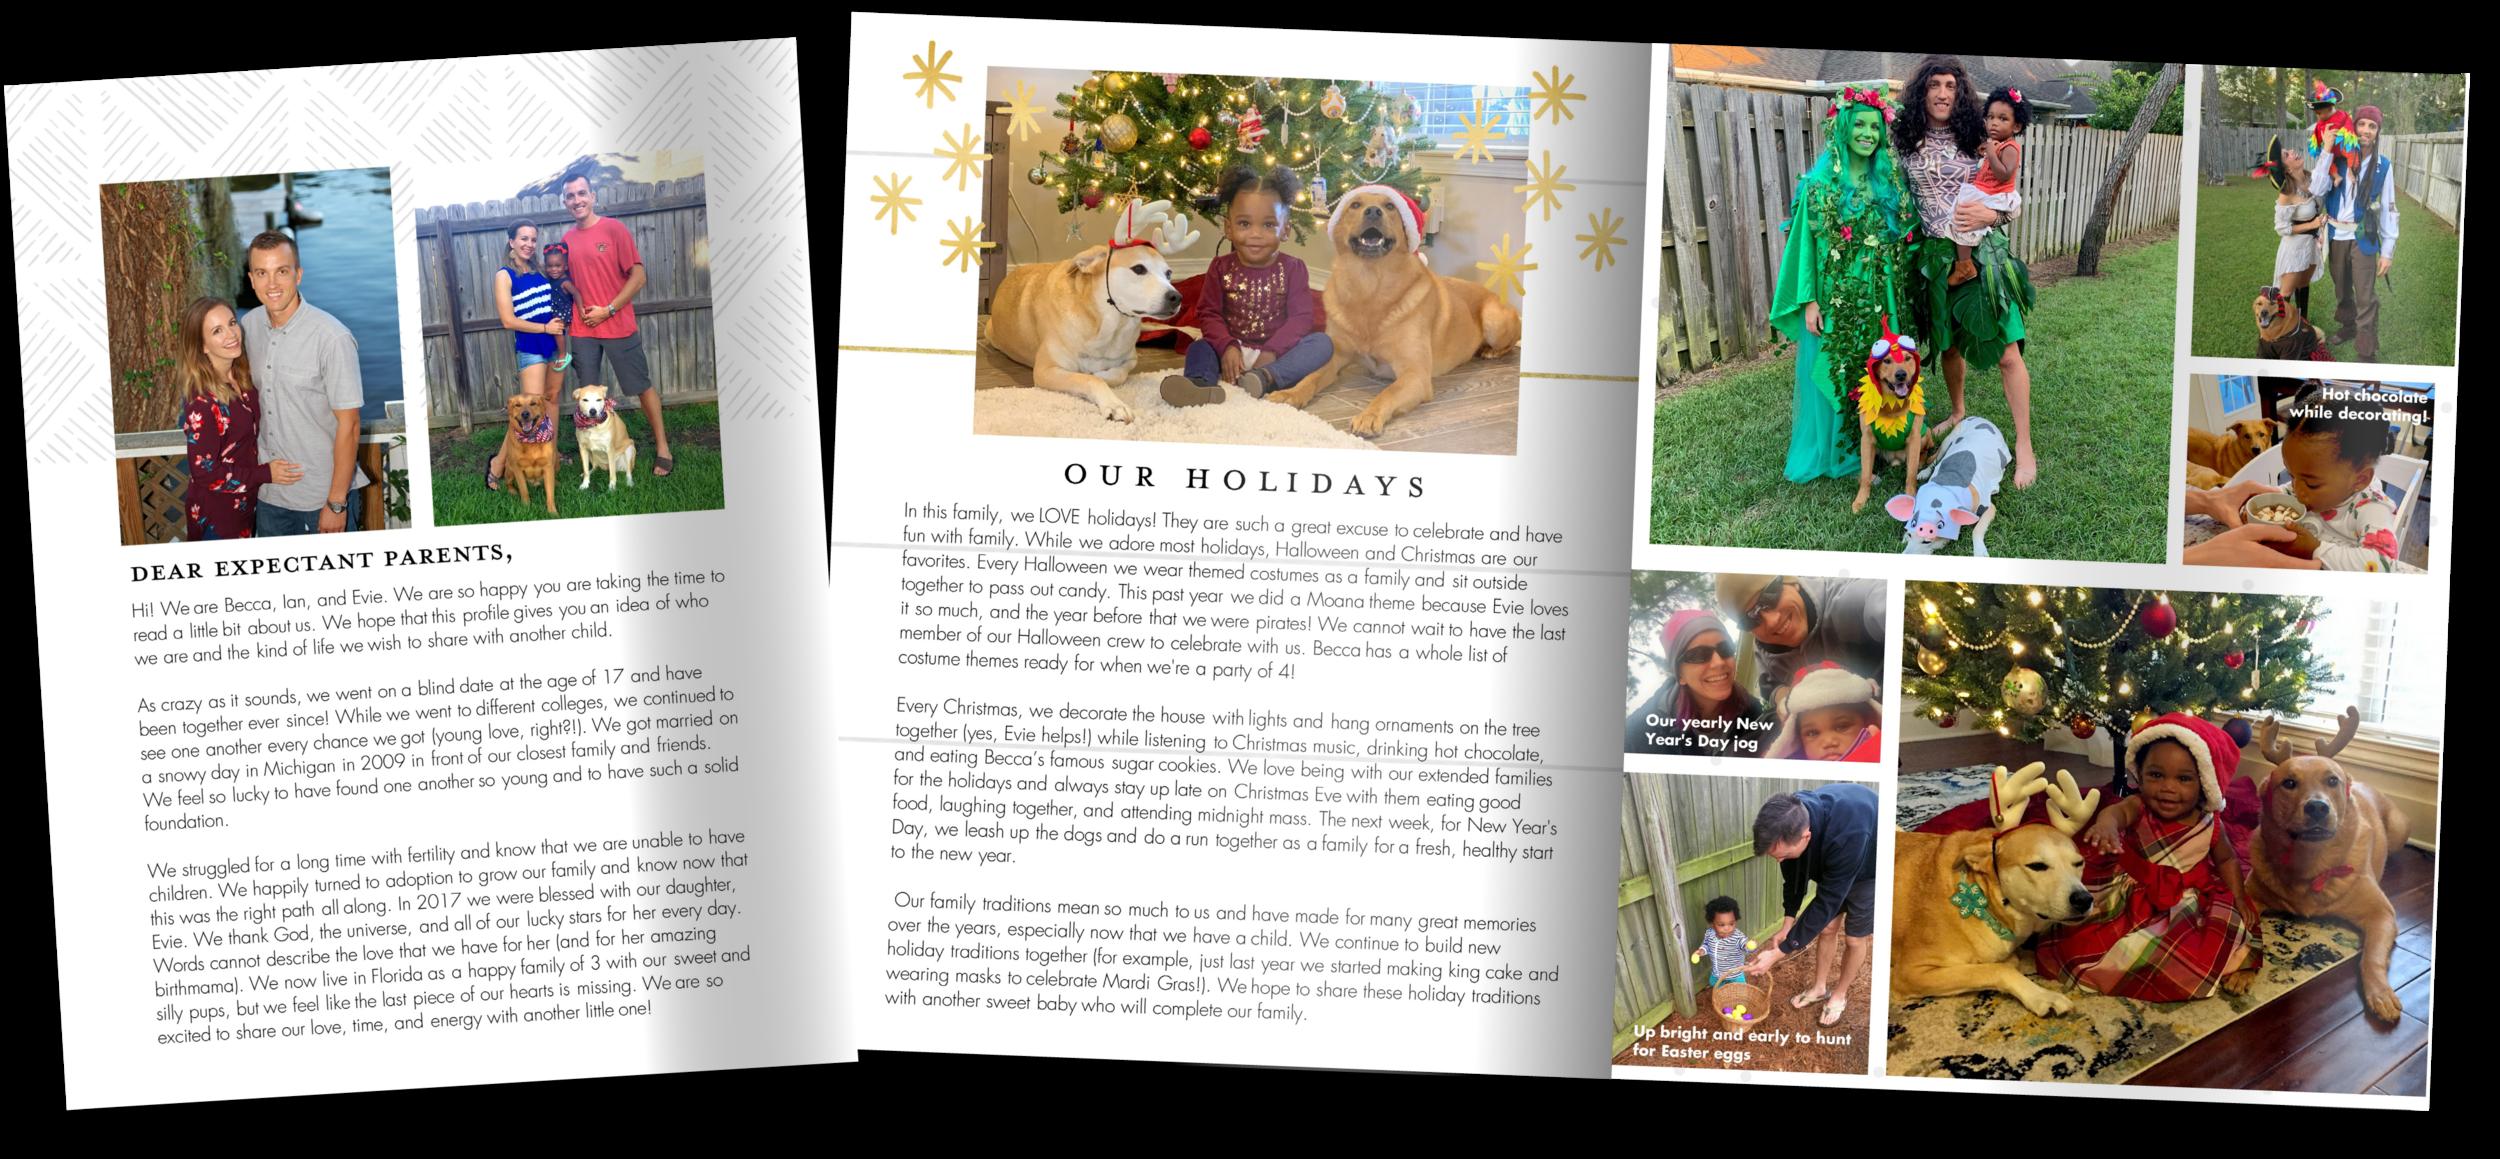 Adoptive parent adoption profile book for Becca and Ian